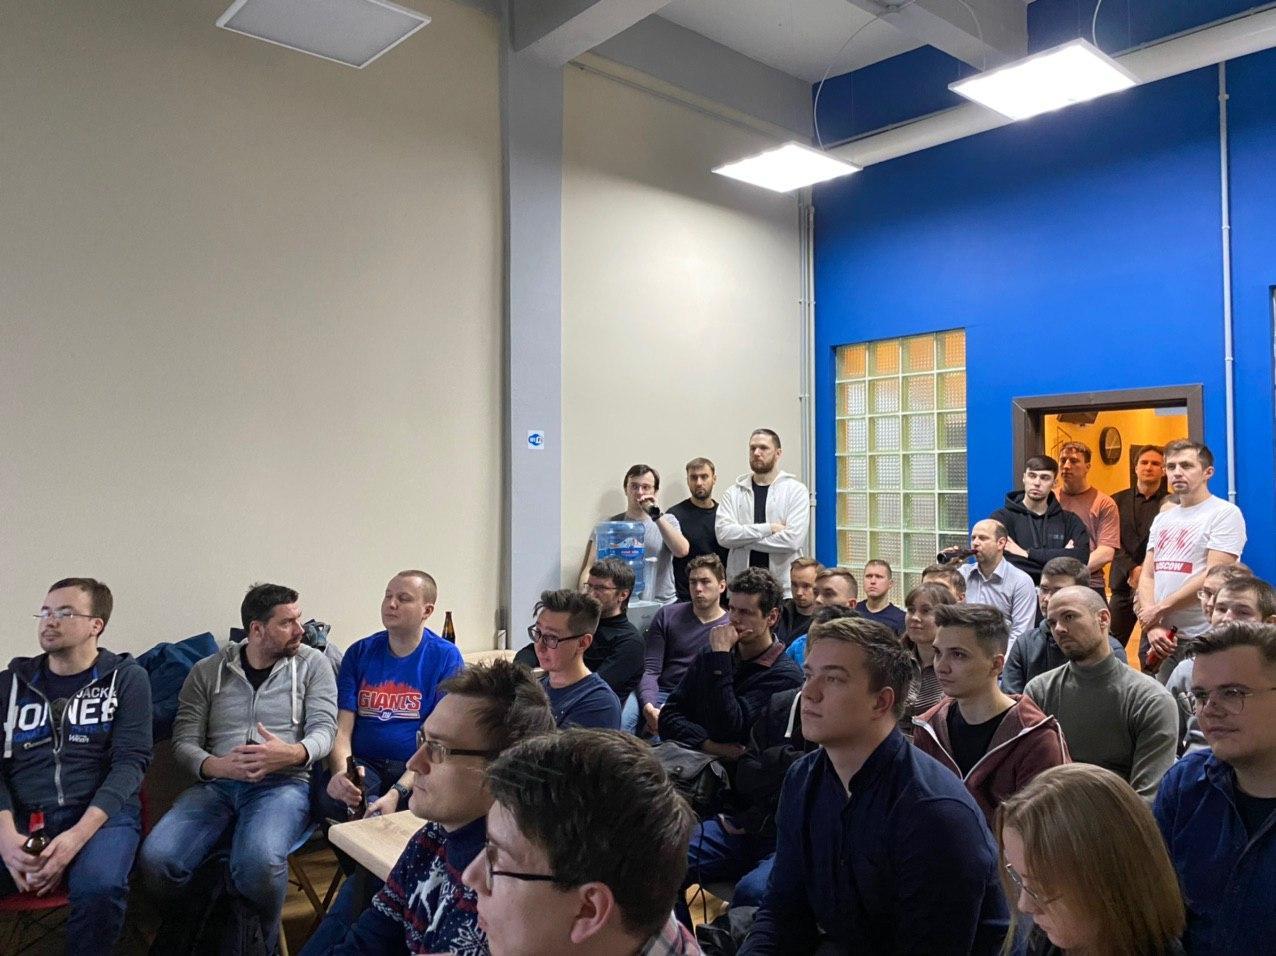 Митапы PHP-сообществ в марте: Питер, Воронеж, Екатеринбург, Казань - 2